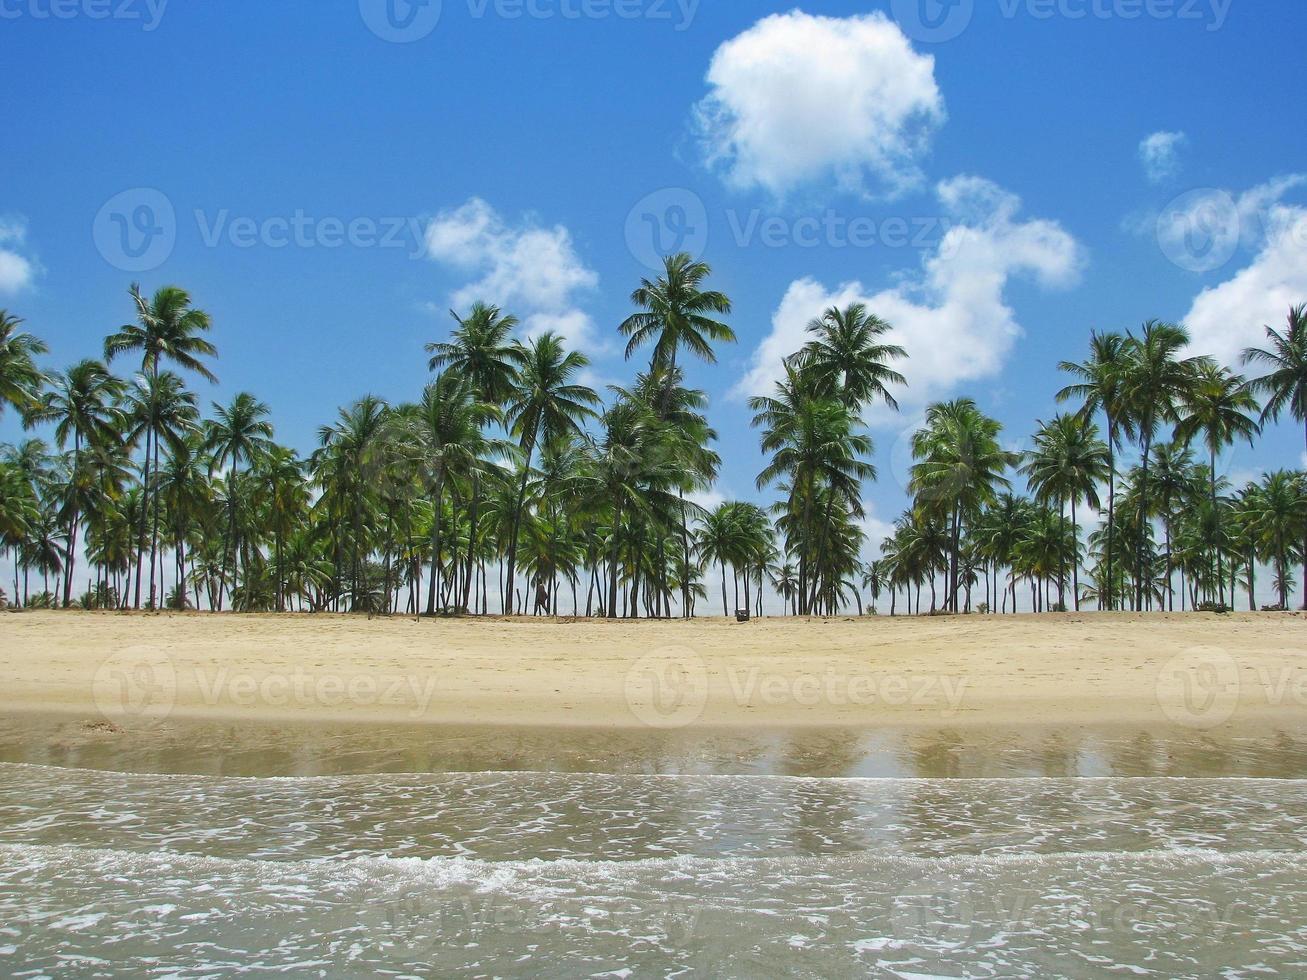 porto de galinhas, Brasilien: underbar drömmande tropisk strand. foto